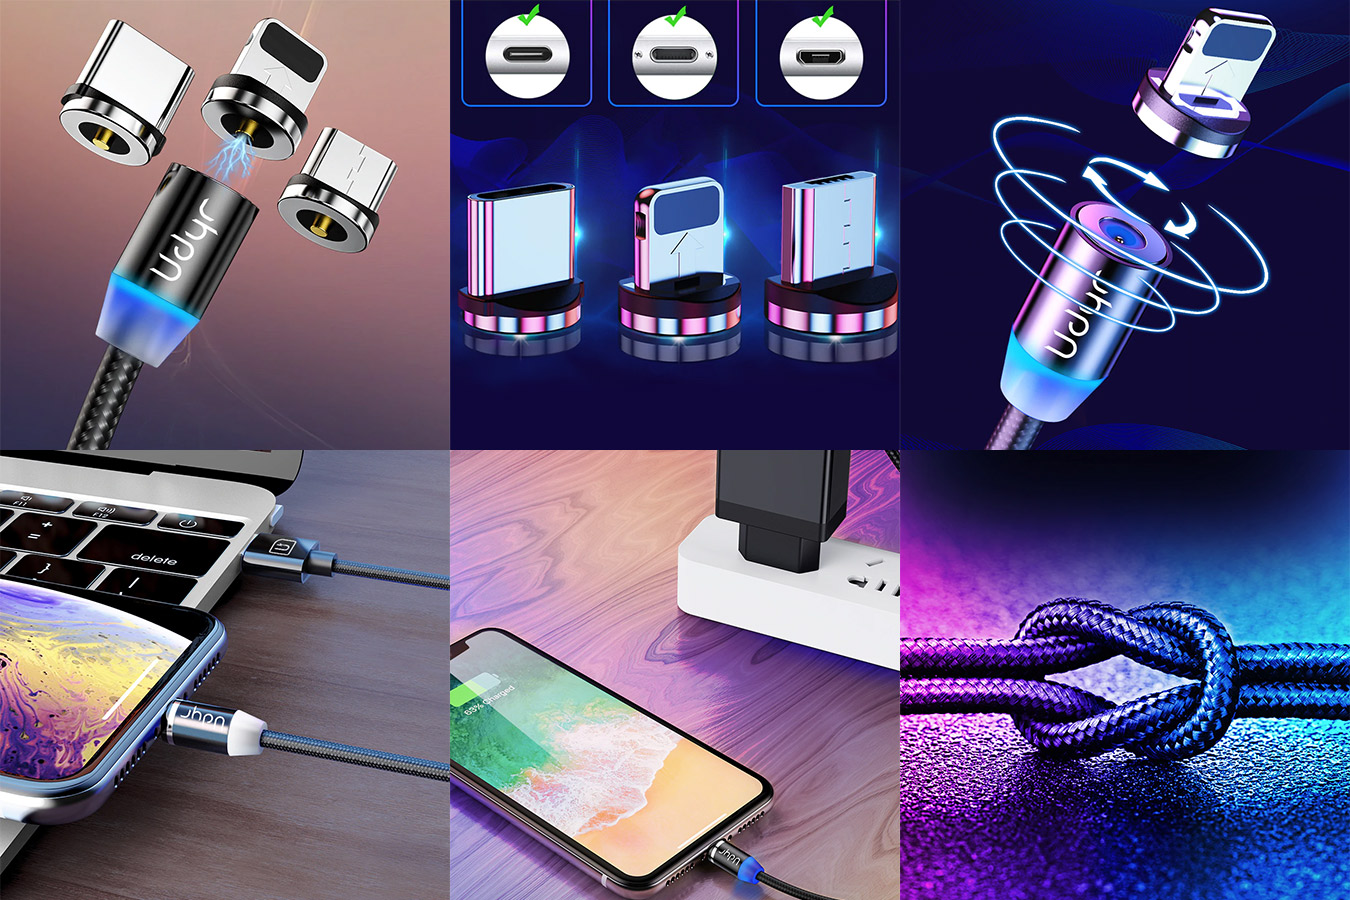 Магнитный кабель Micro USB для iPhone, Samsung, Android